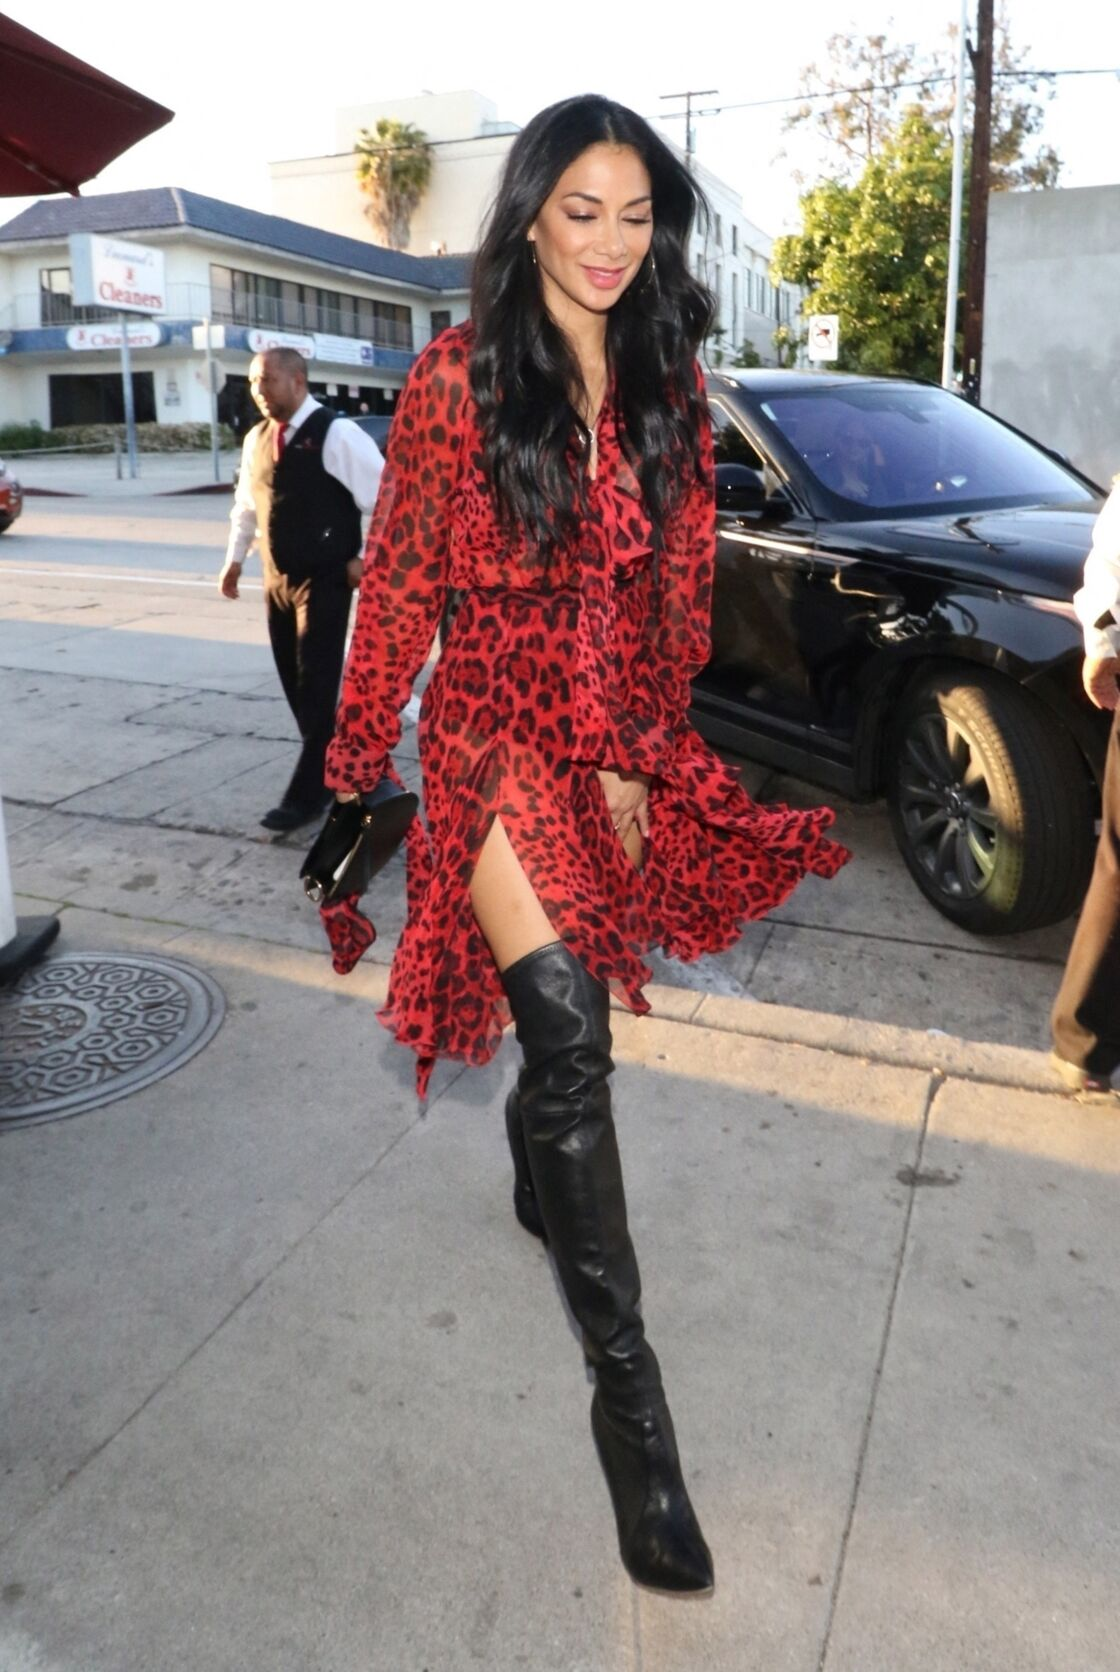 Nicole Scherzinger, rayonnante dans une robe léopard rouge.